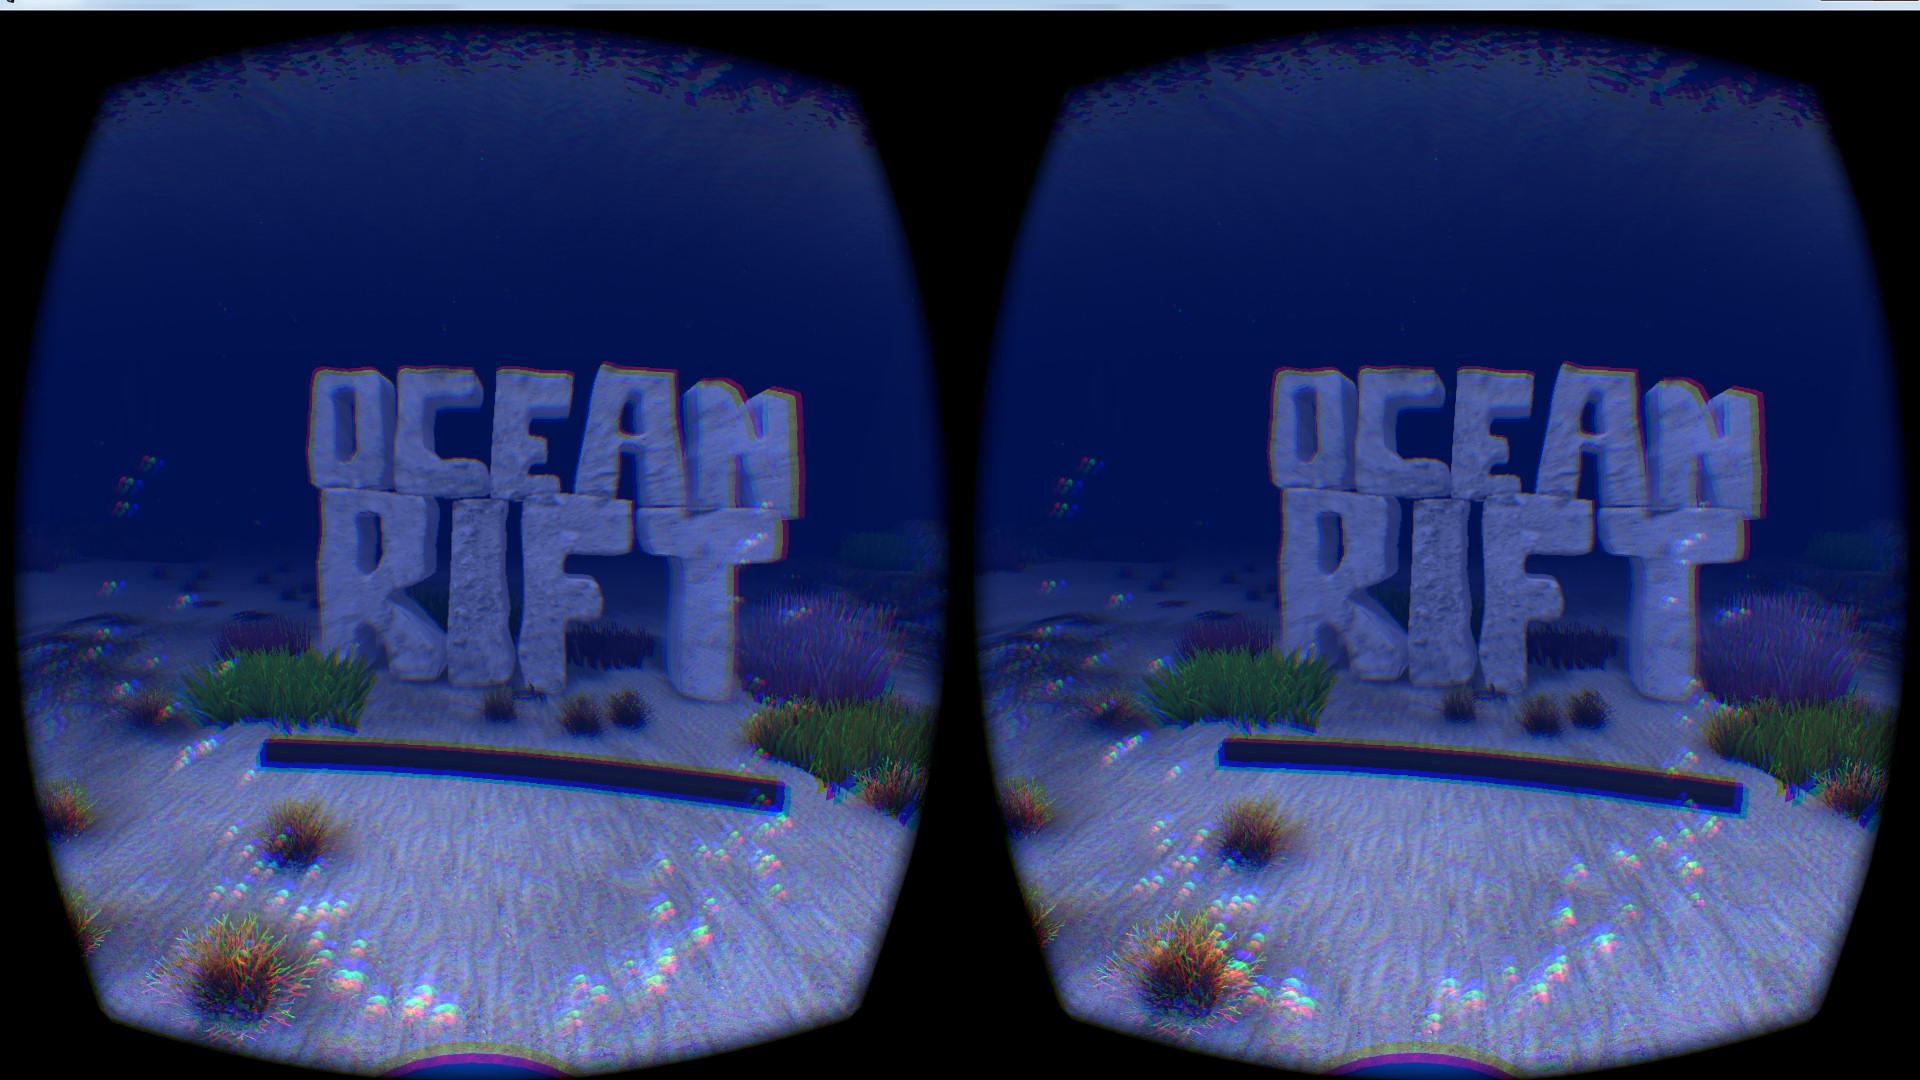 Ocean-Rift-in-DK2